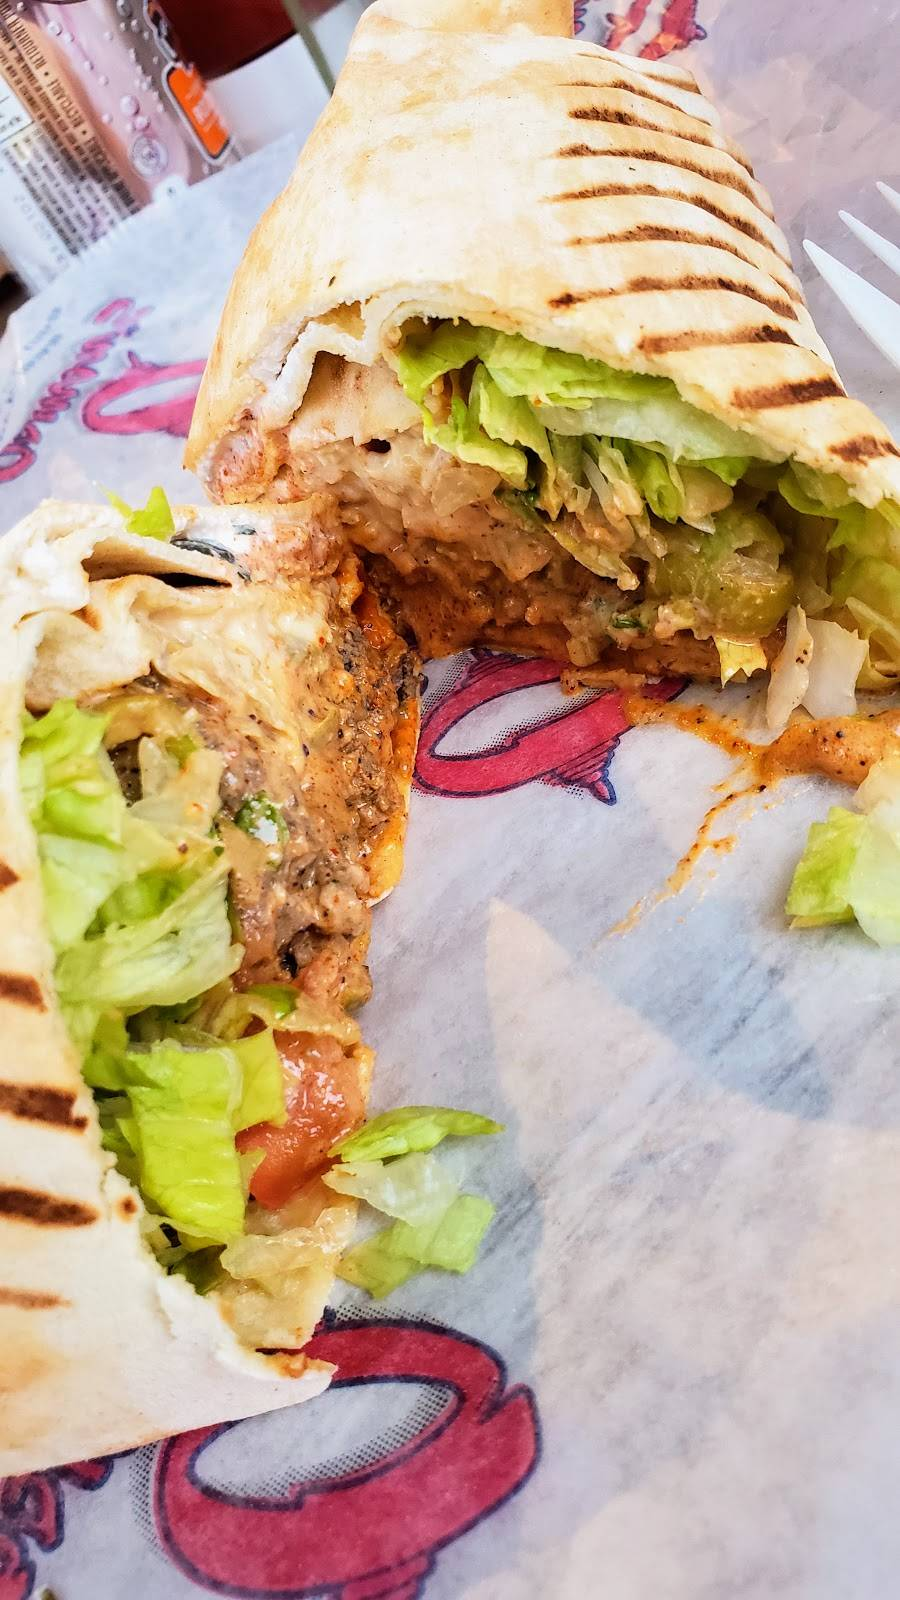 Osmows Shawarma | restaurant | 30 Diana Dr Building 4, Unit 1, Orillia, ON L3V 6H2, Canada | 7053265256 OR +1 705-326-5256